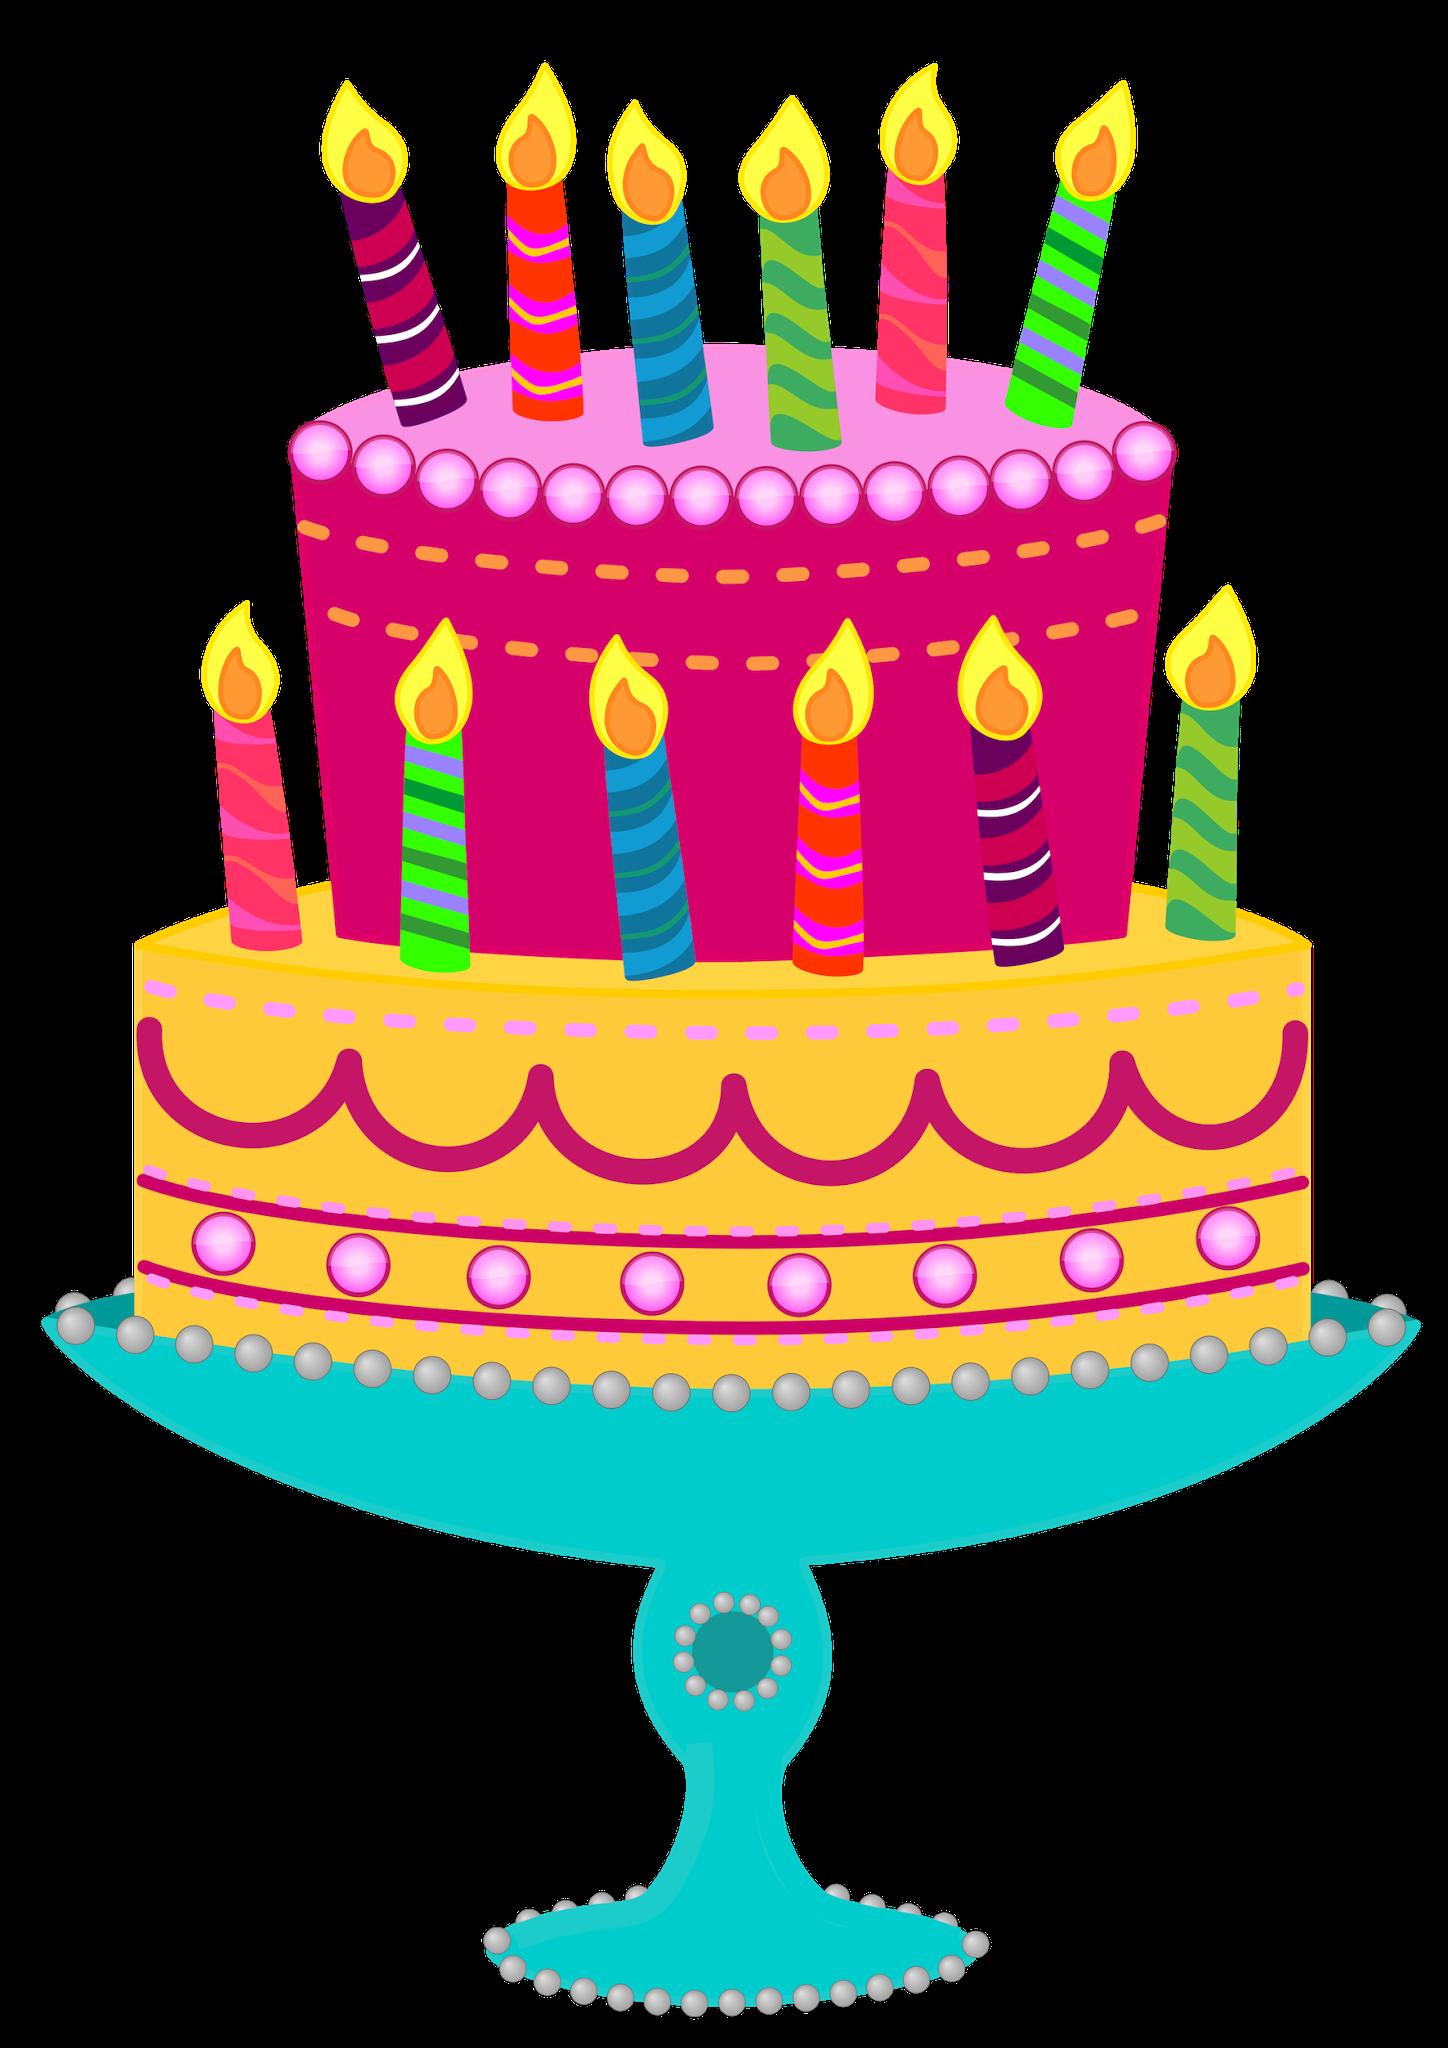 Free Cake Images.